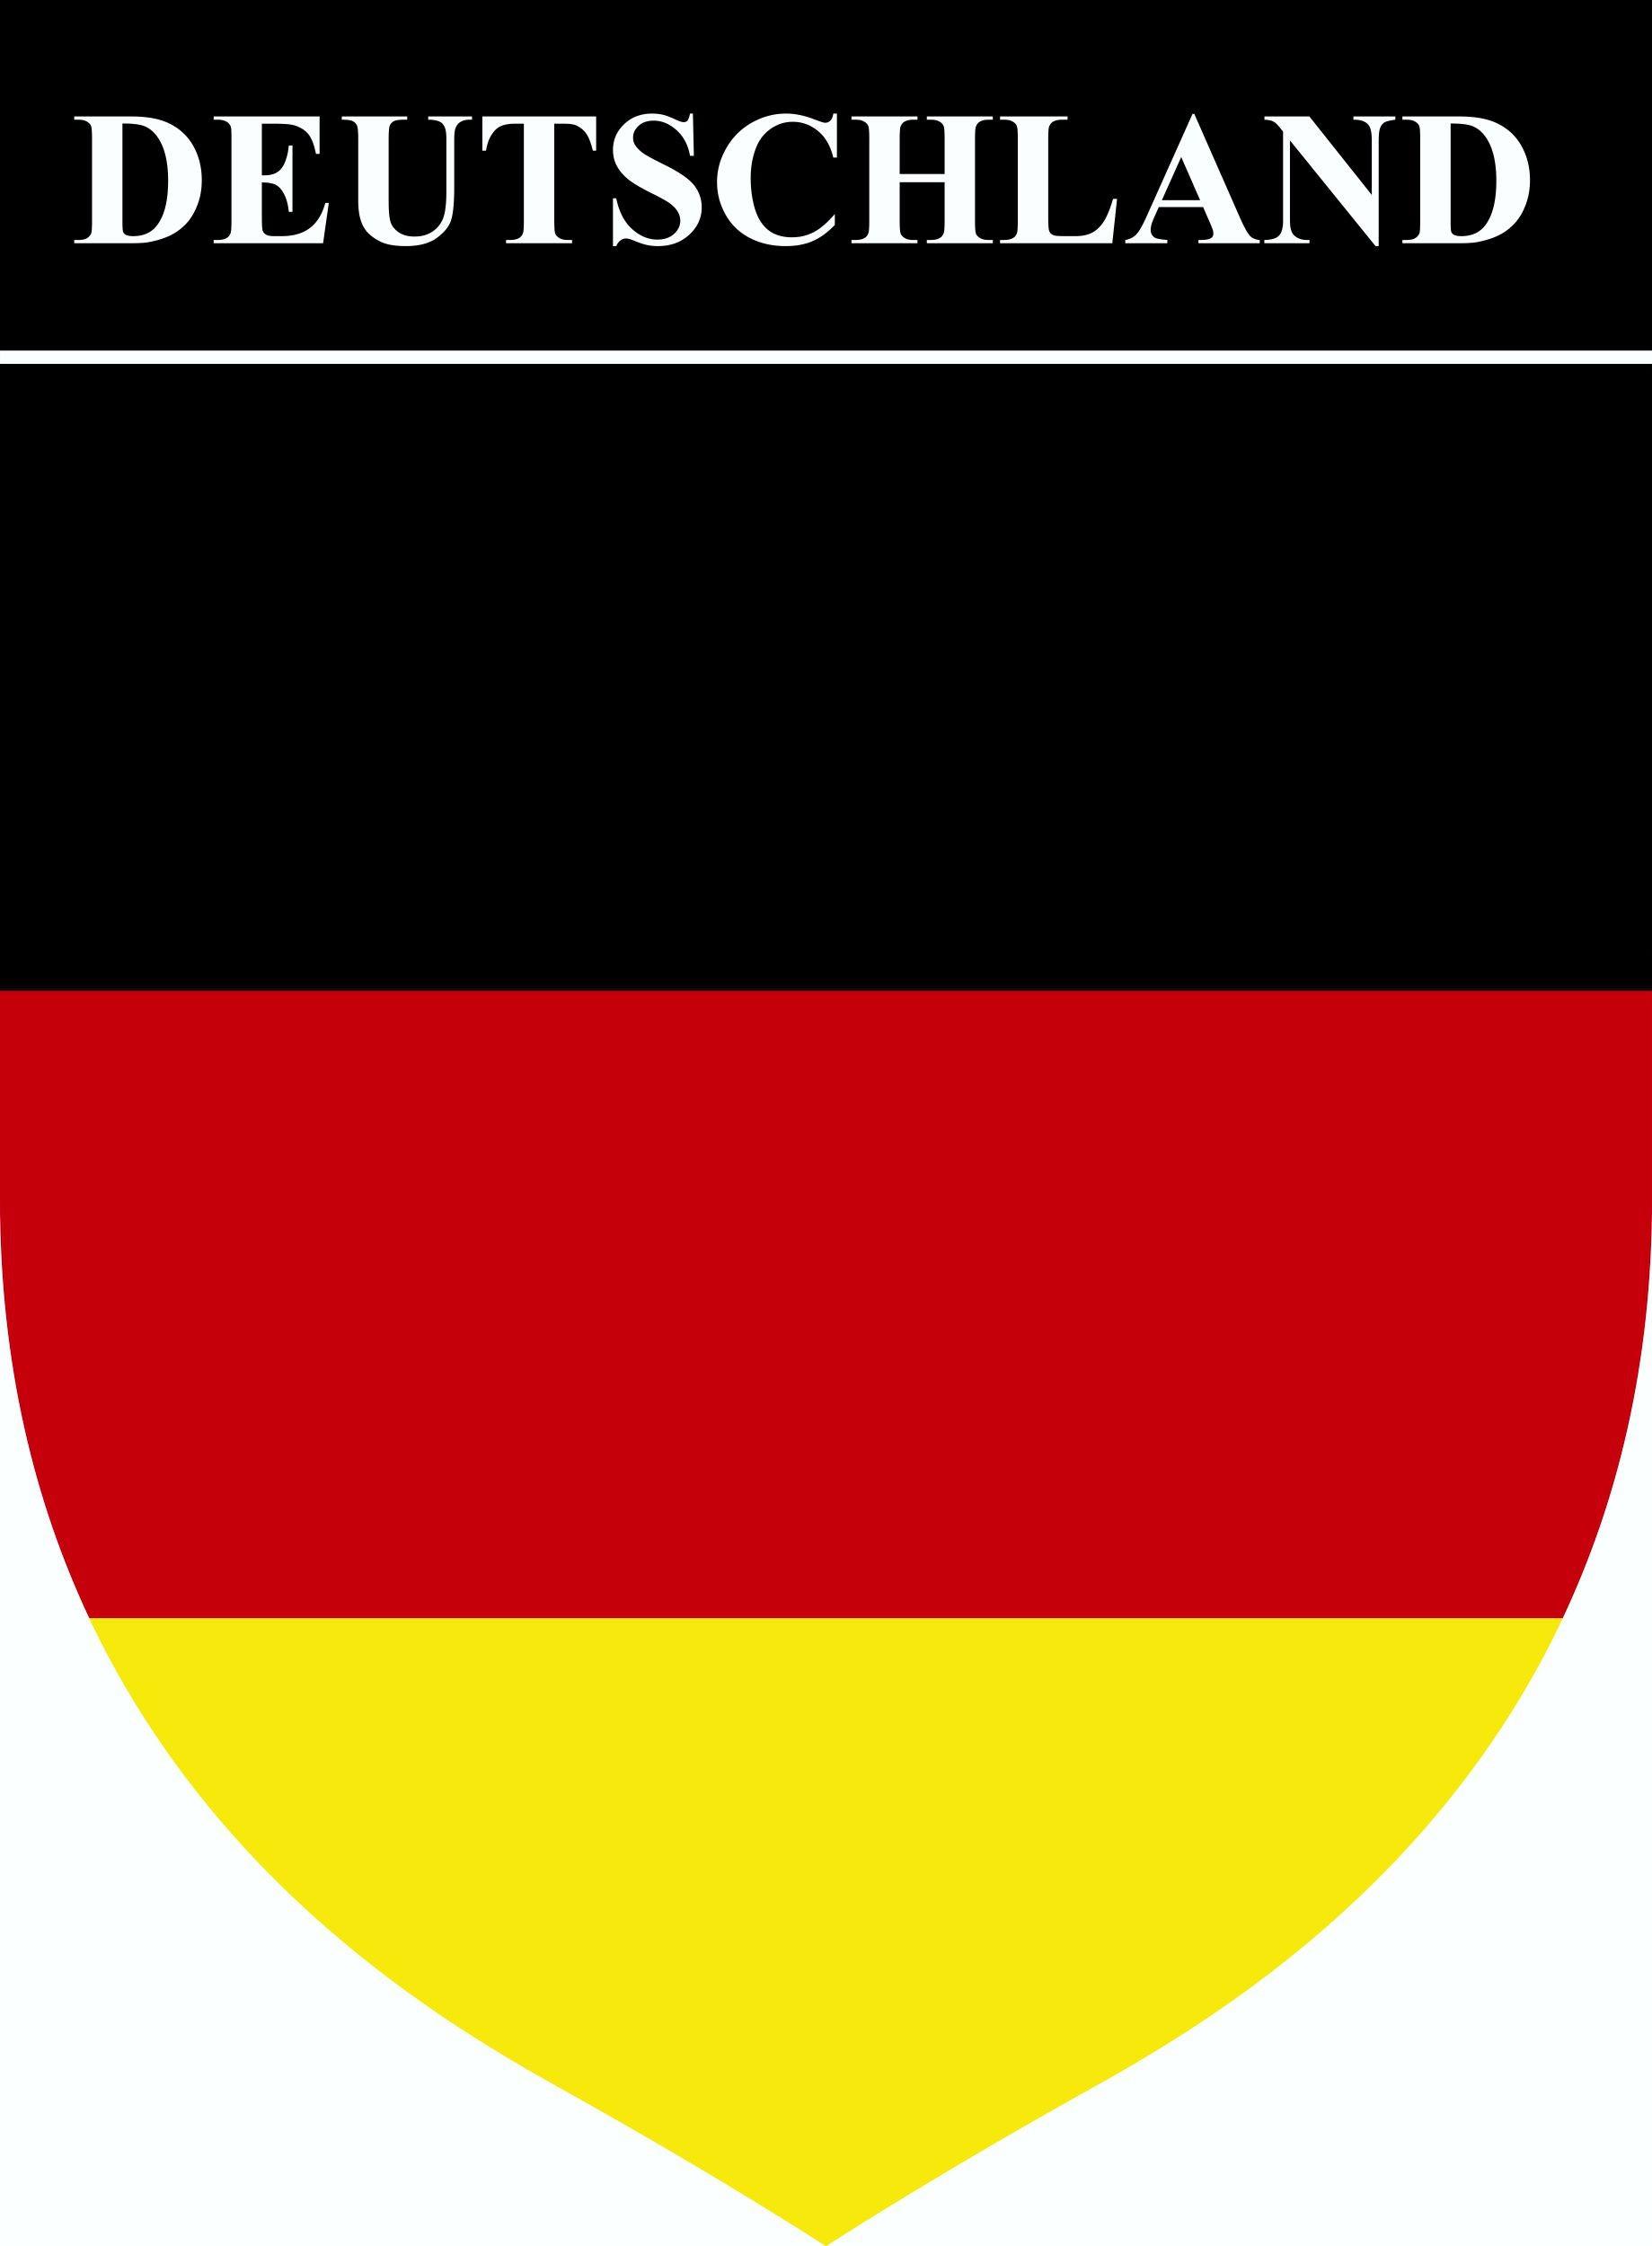 Autocollant amoiries Deutschland 85 x 65 mm – Bild 1